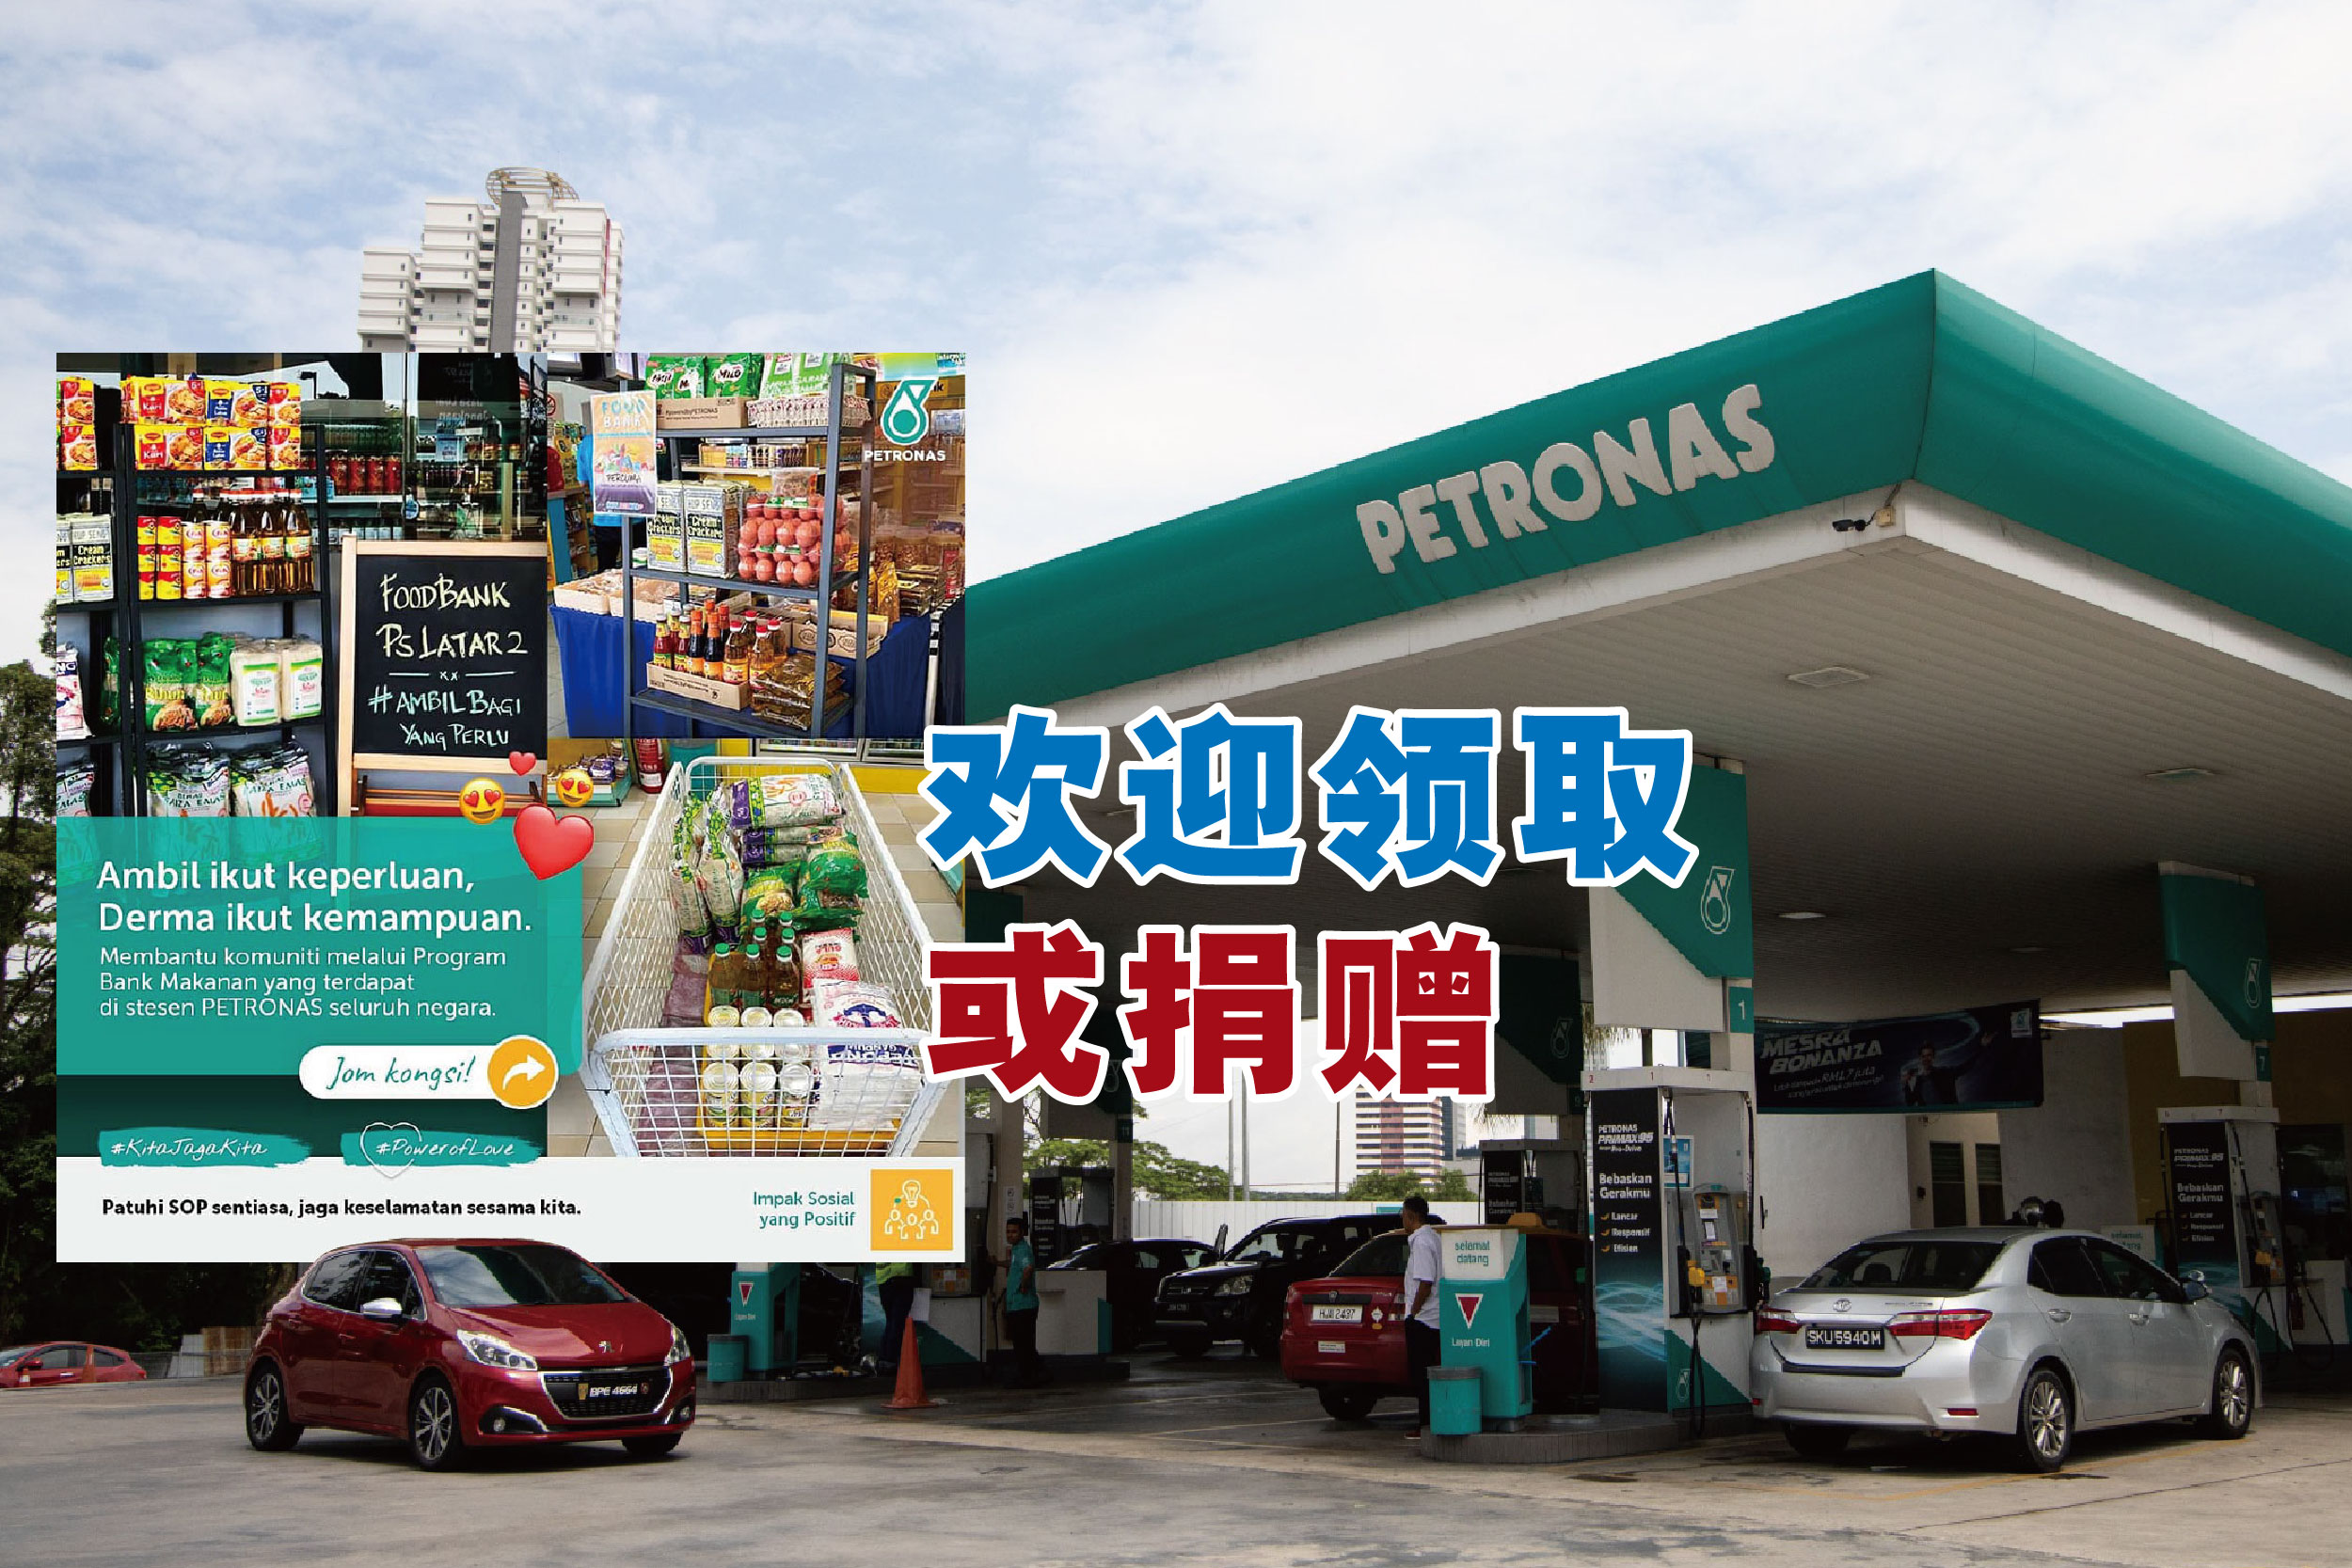 Petronas在全国逾300家油站推出食物银行计划,为陷困人士提供物资援助。-精彩大马制图-